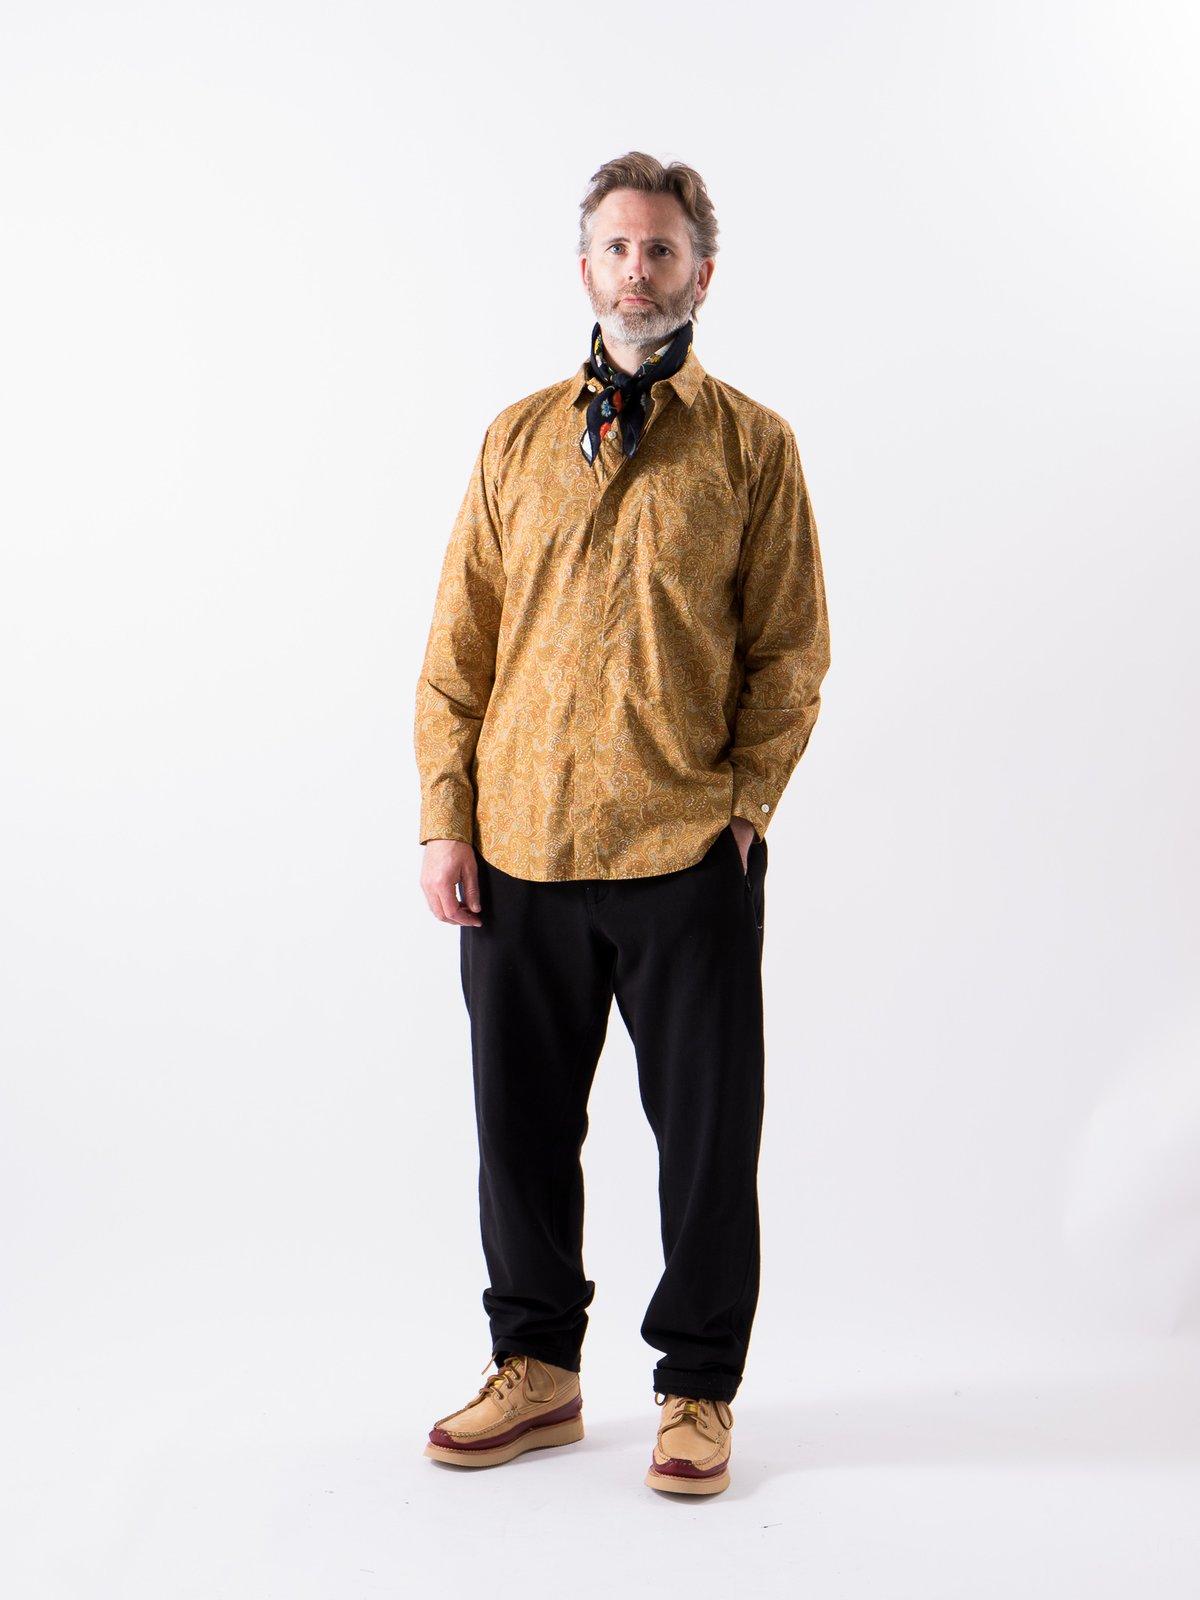 Tan/Olive Cotton Paisley Print Short Collar Shirt - Image 2